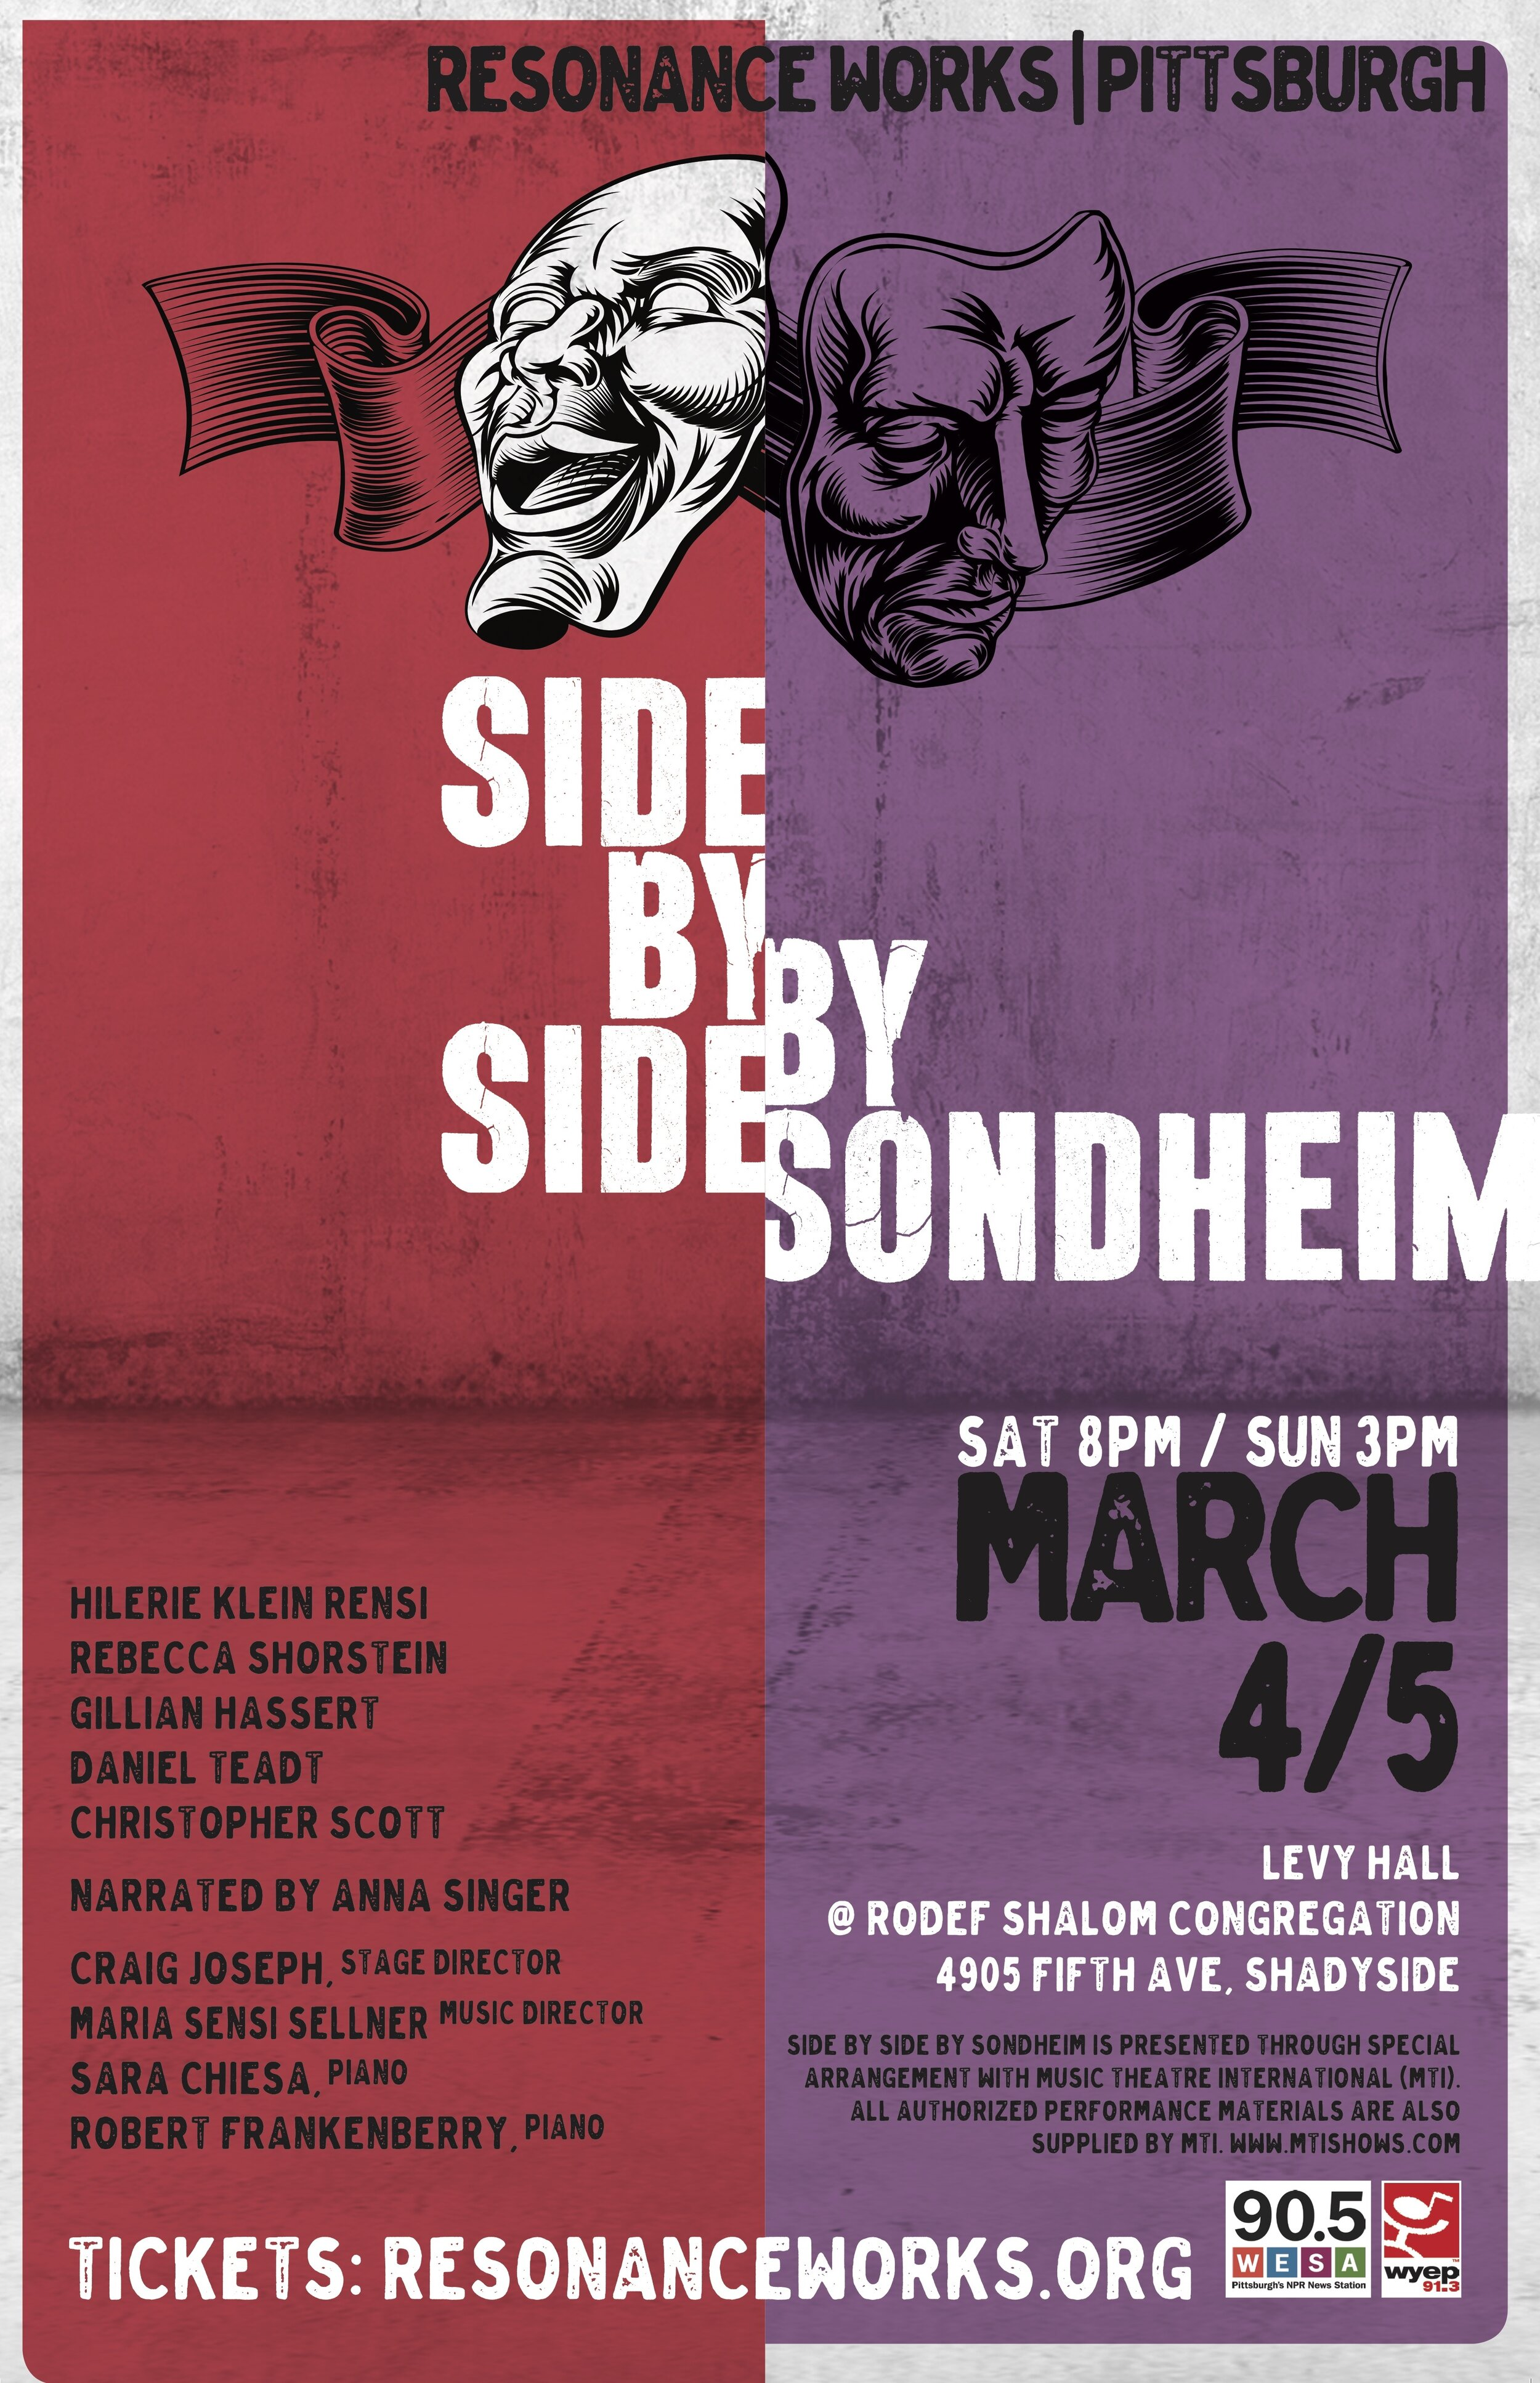 RW16 SidebySide_Poster_v4.jpg